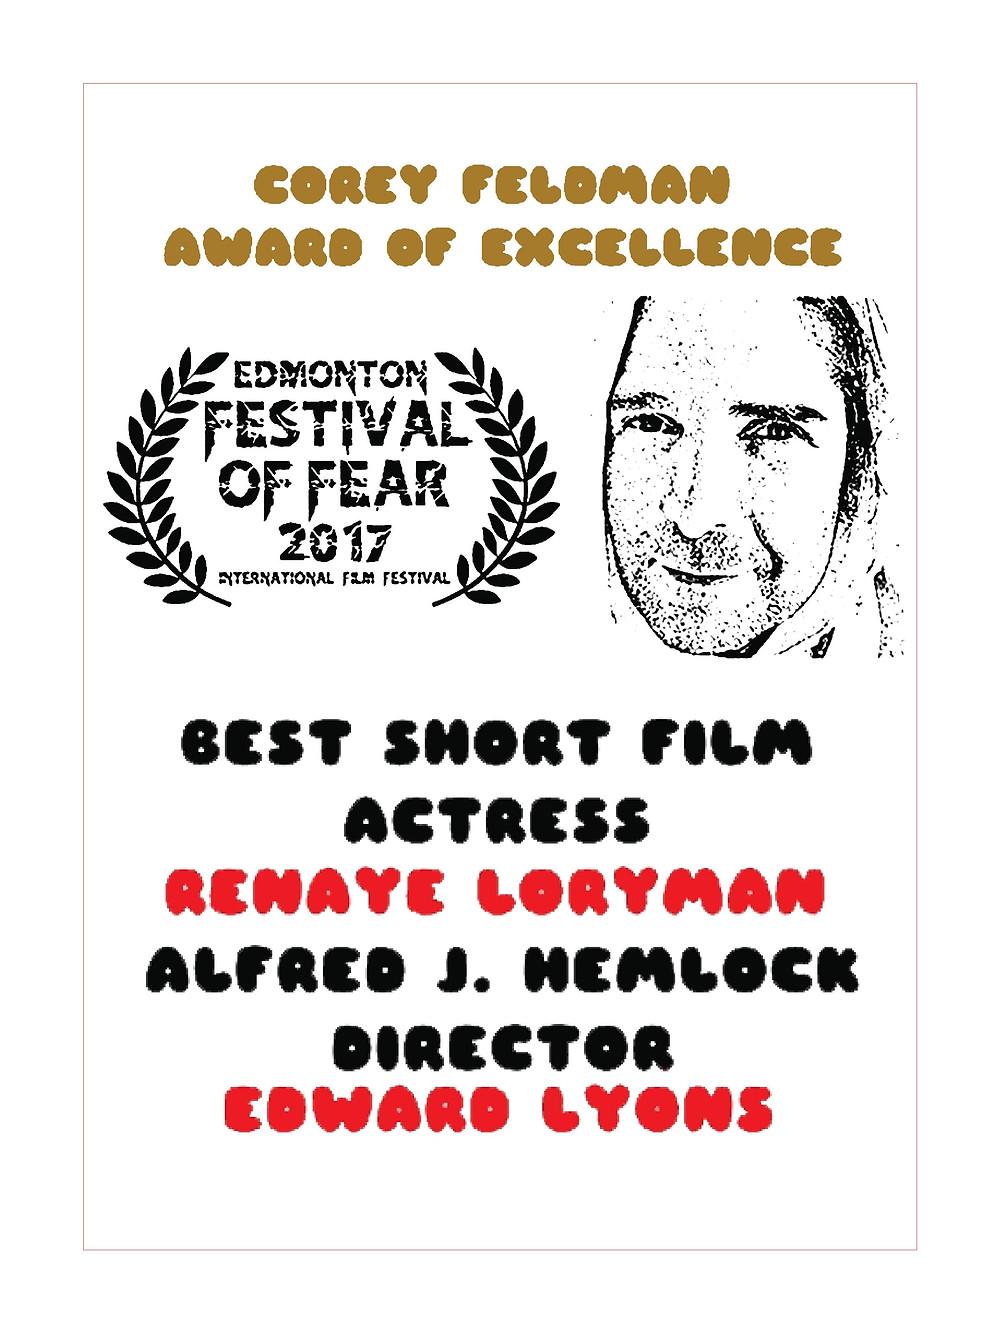 Renaye Loryman Wins Best Short Film Actress for Alfred J Hemlock at Edmonton Festival of Fear